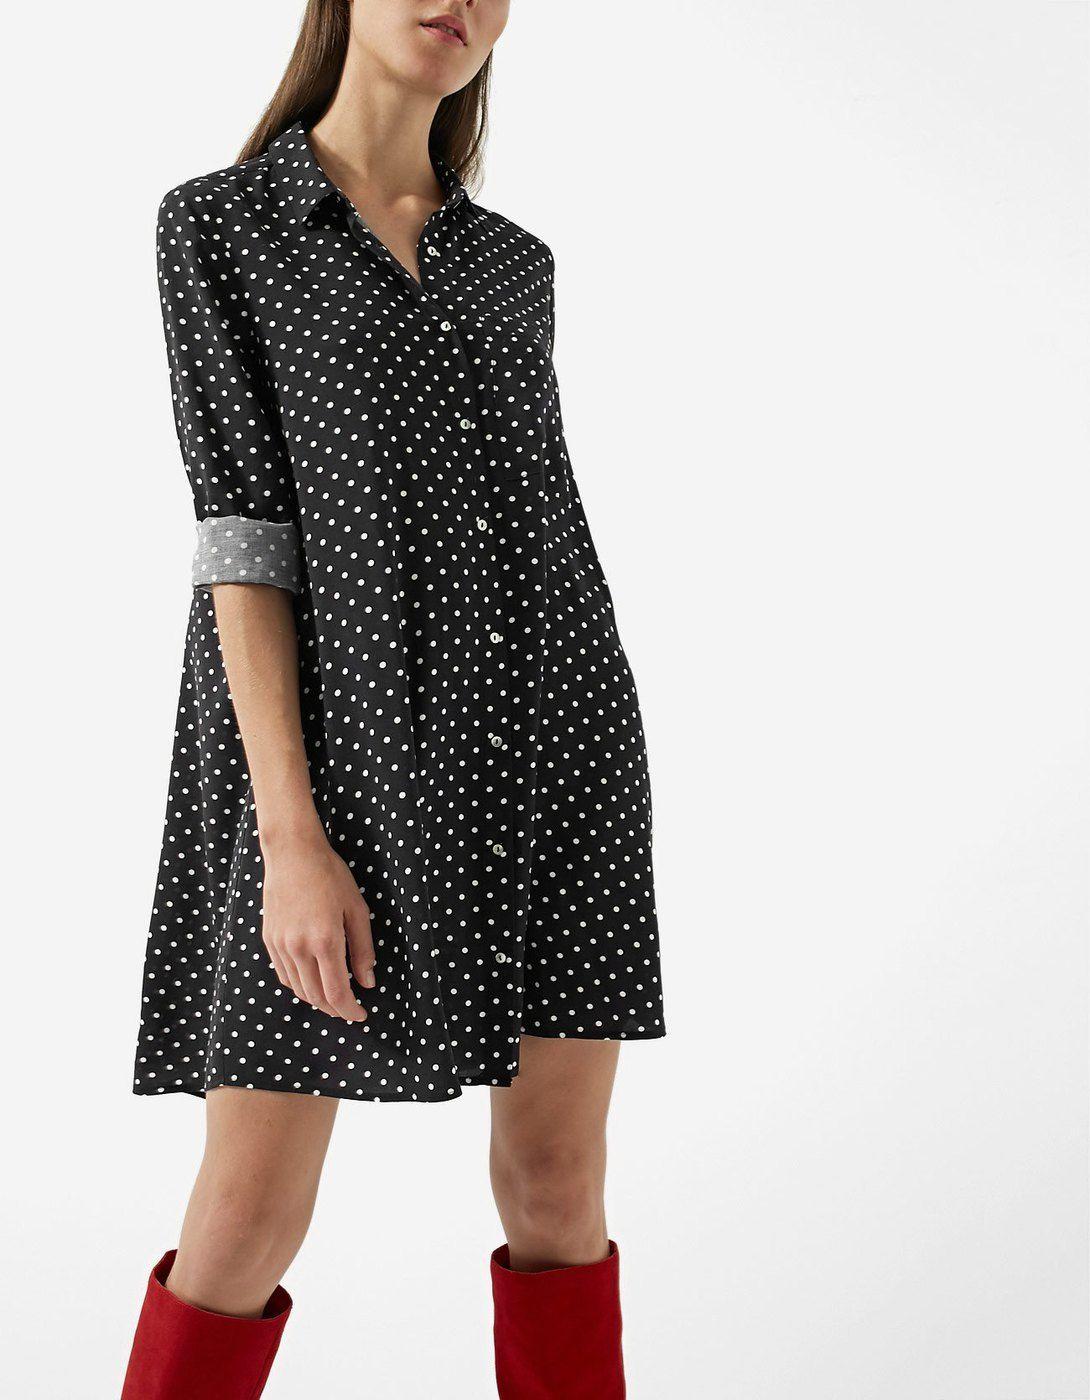 2ef87830954 Printed shirt dress with 3 4 length sleeves - Šaty